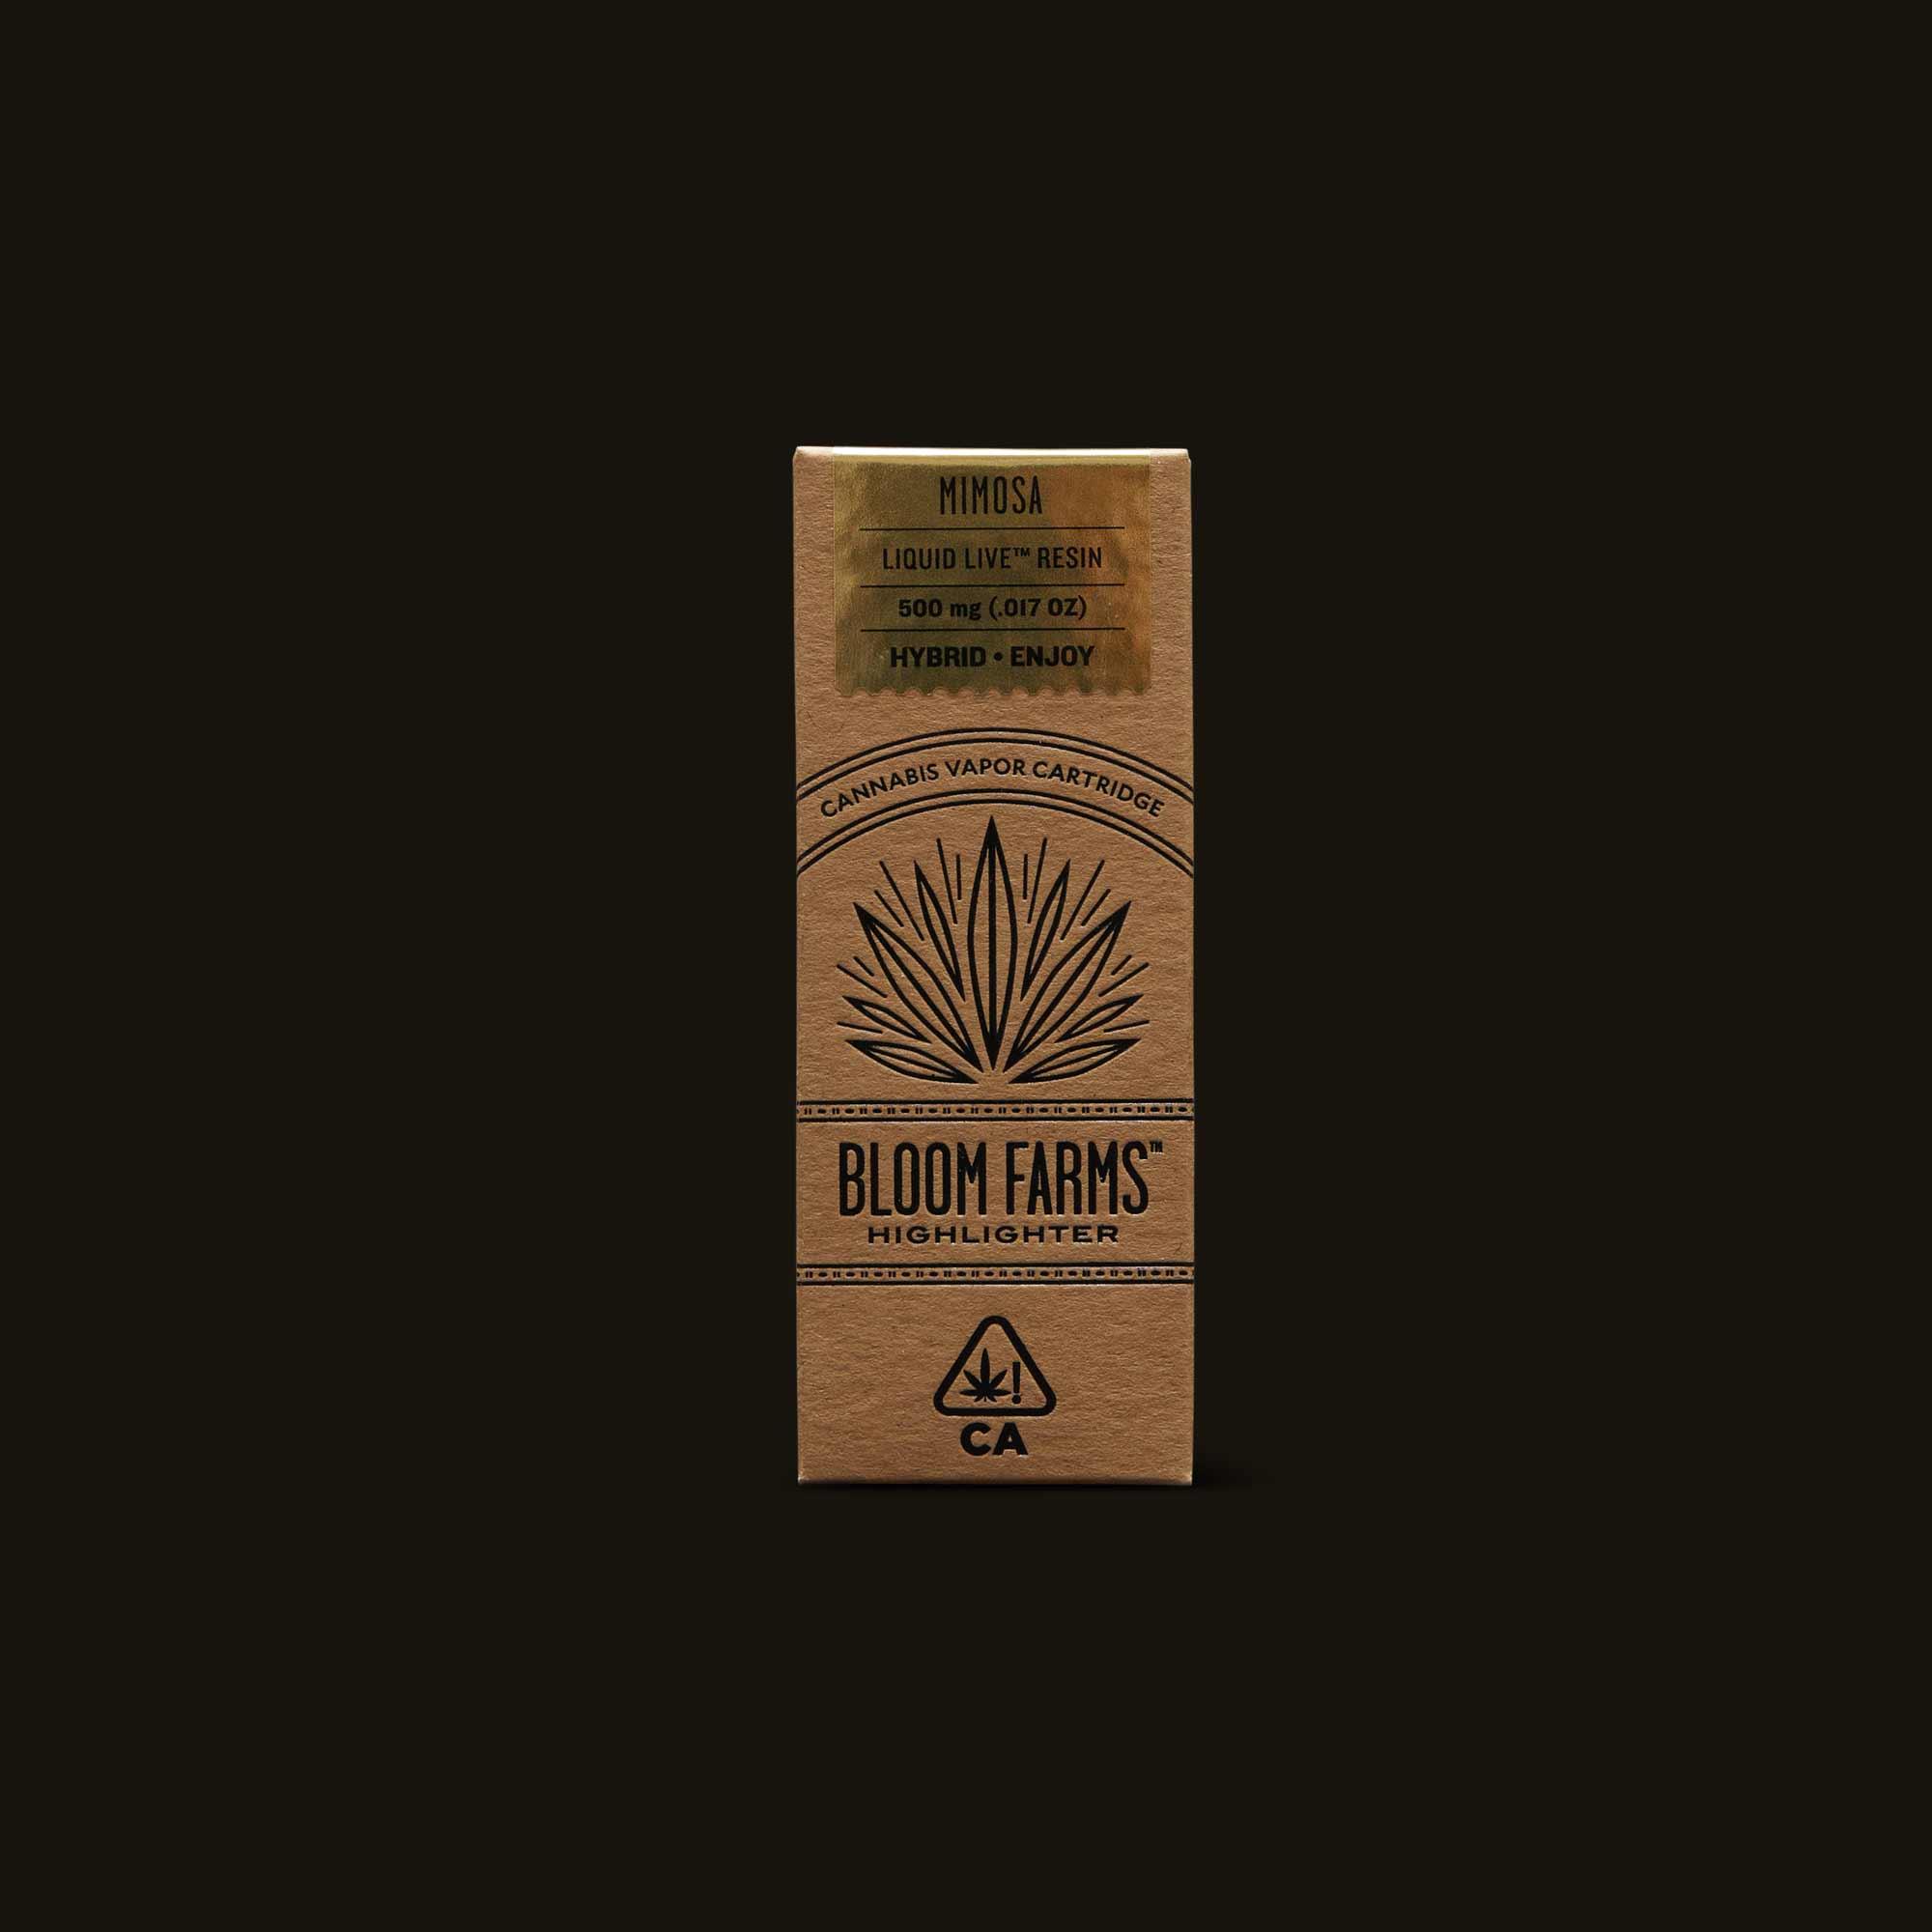 Bloom Farms Mimosa Highlighter